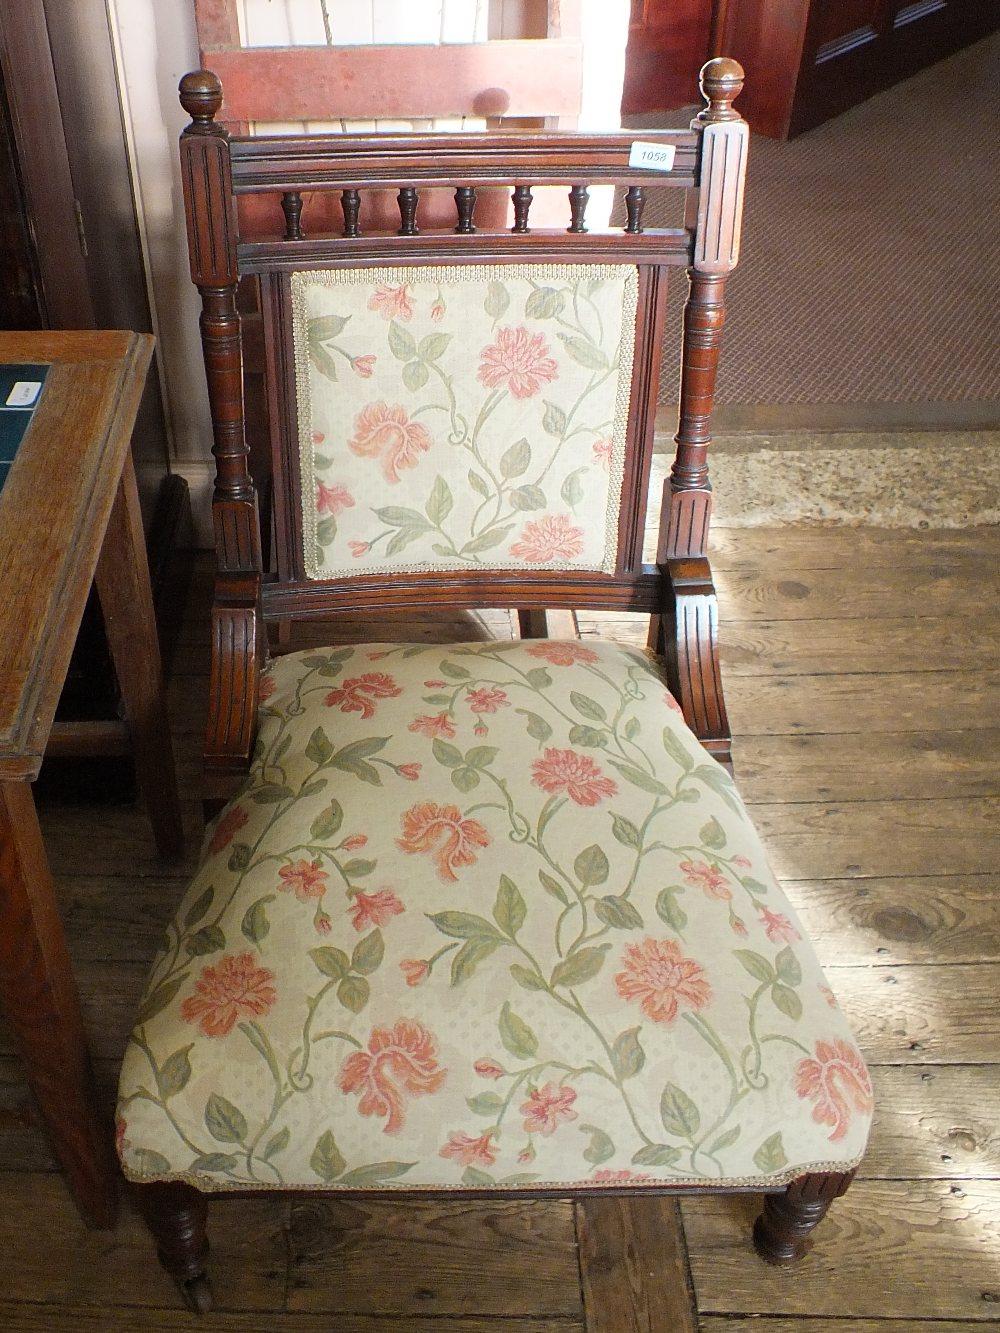 Lot 1058 - An Edwardian mahogany lady's chair